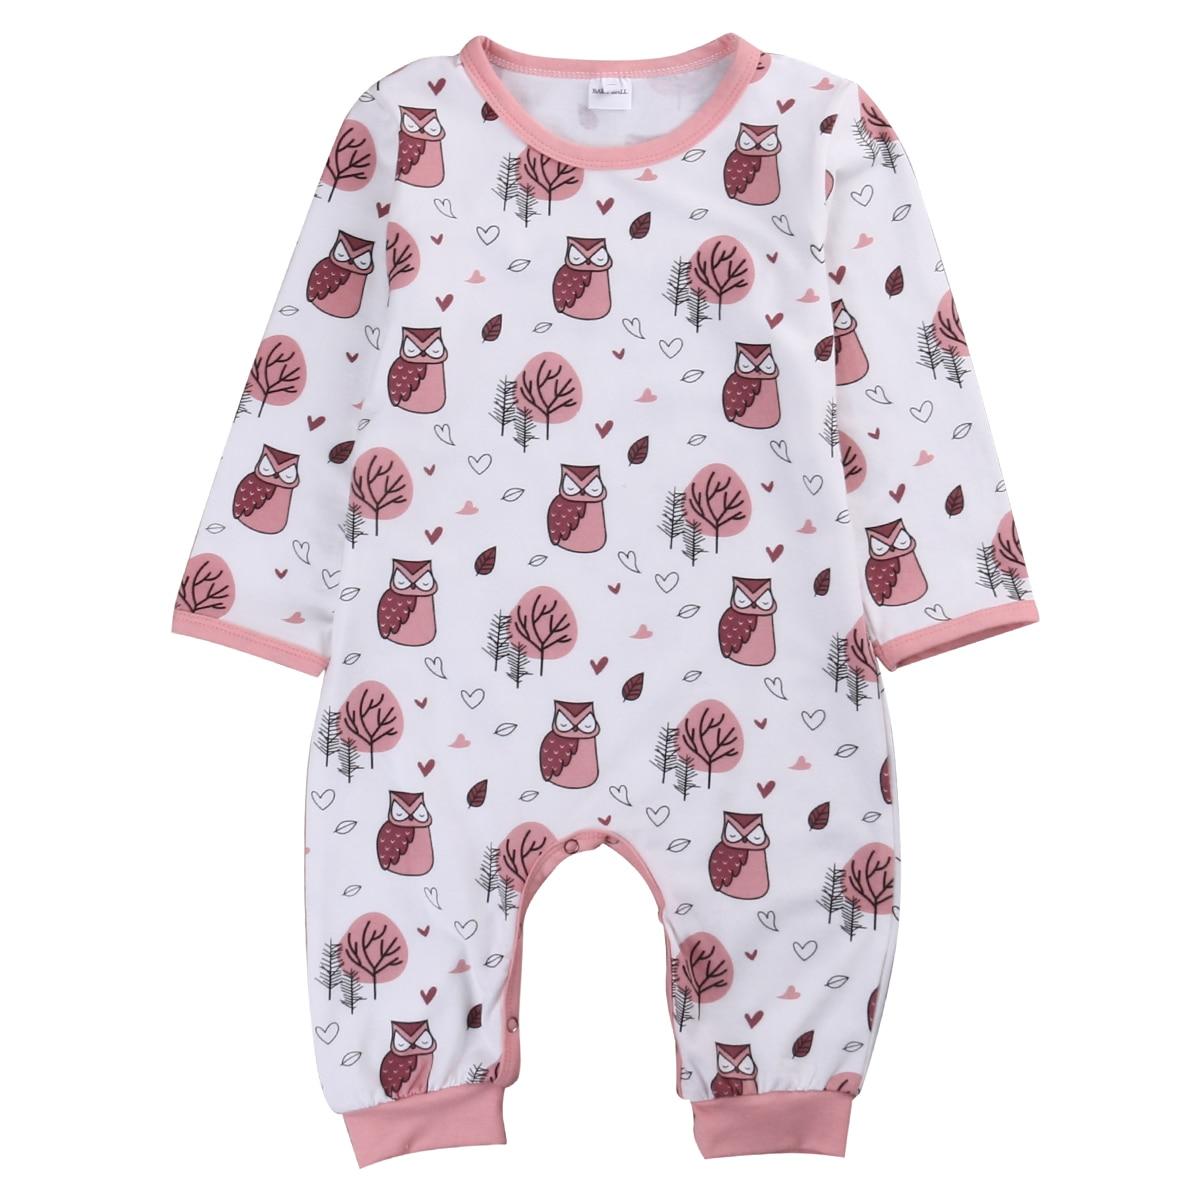 Newborn Baby Boys Girls Cute Owl Clothes long sleeve